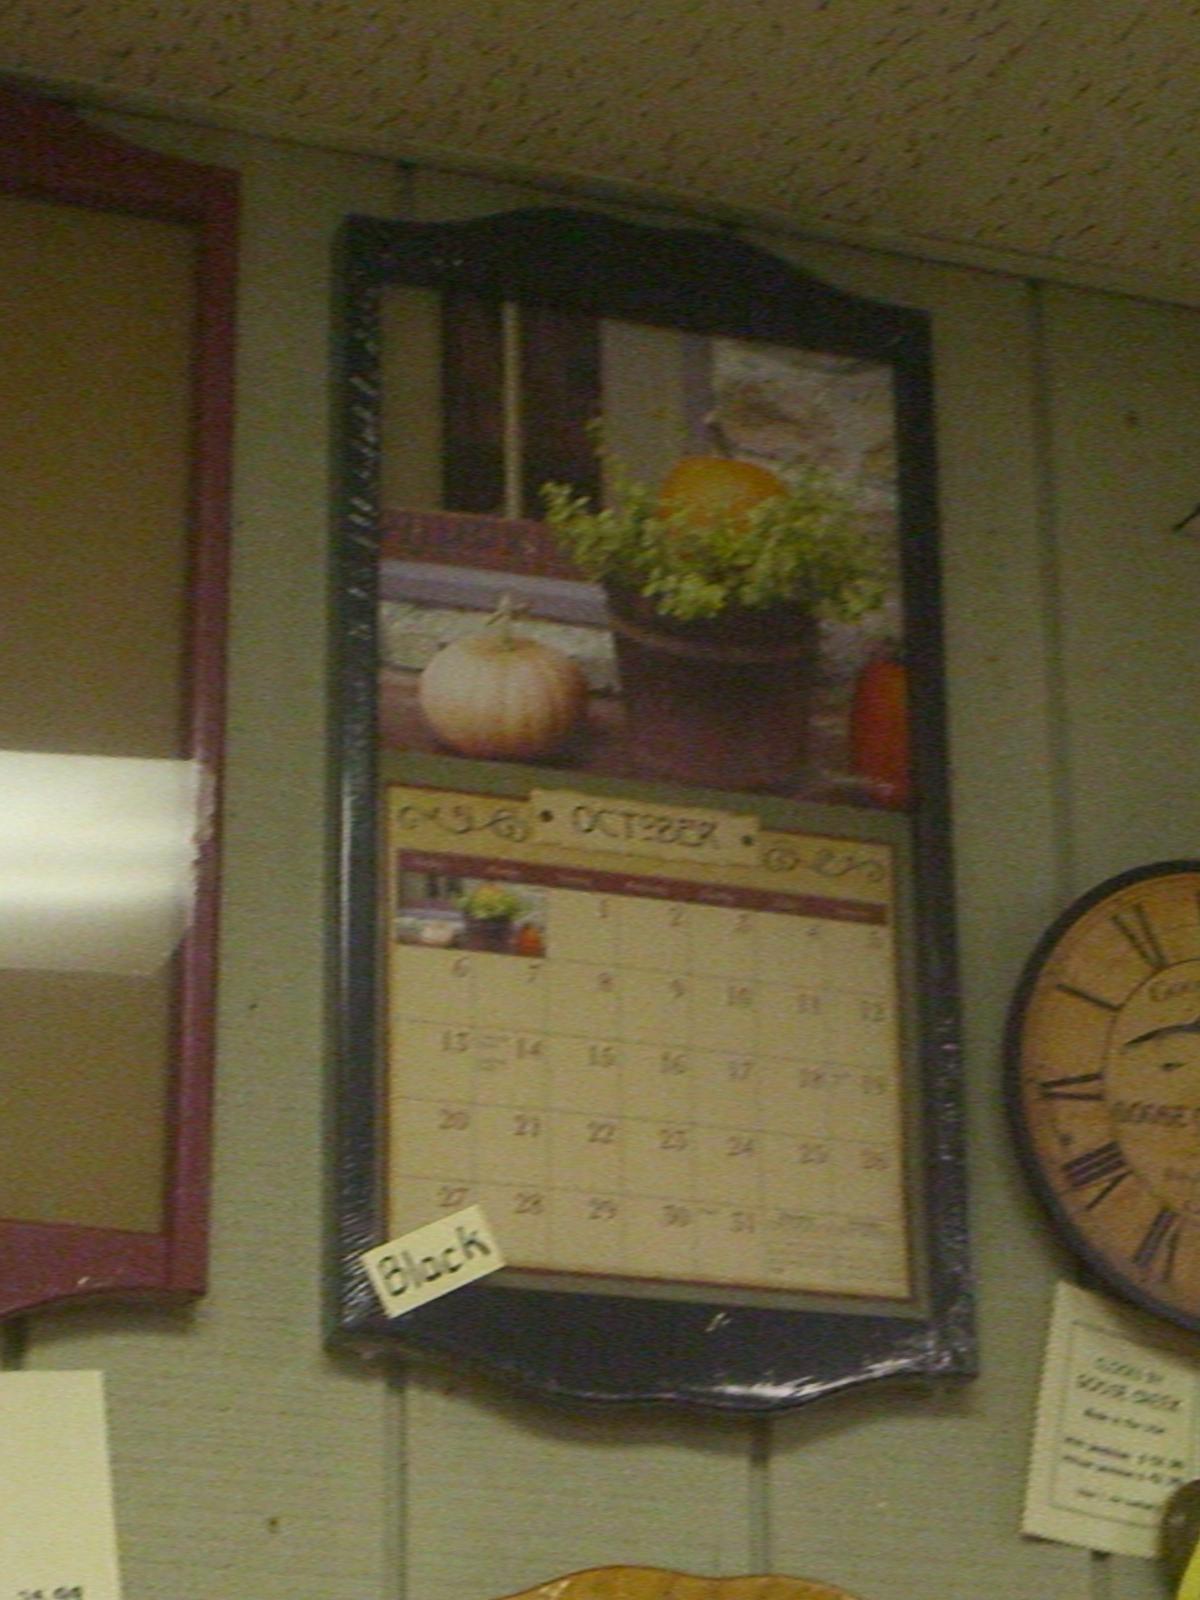 Wall Calendar Frames And Holders  Calendar Inspiration Design within Calendar Frames And Holders